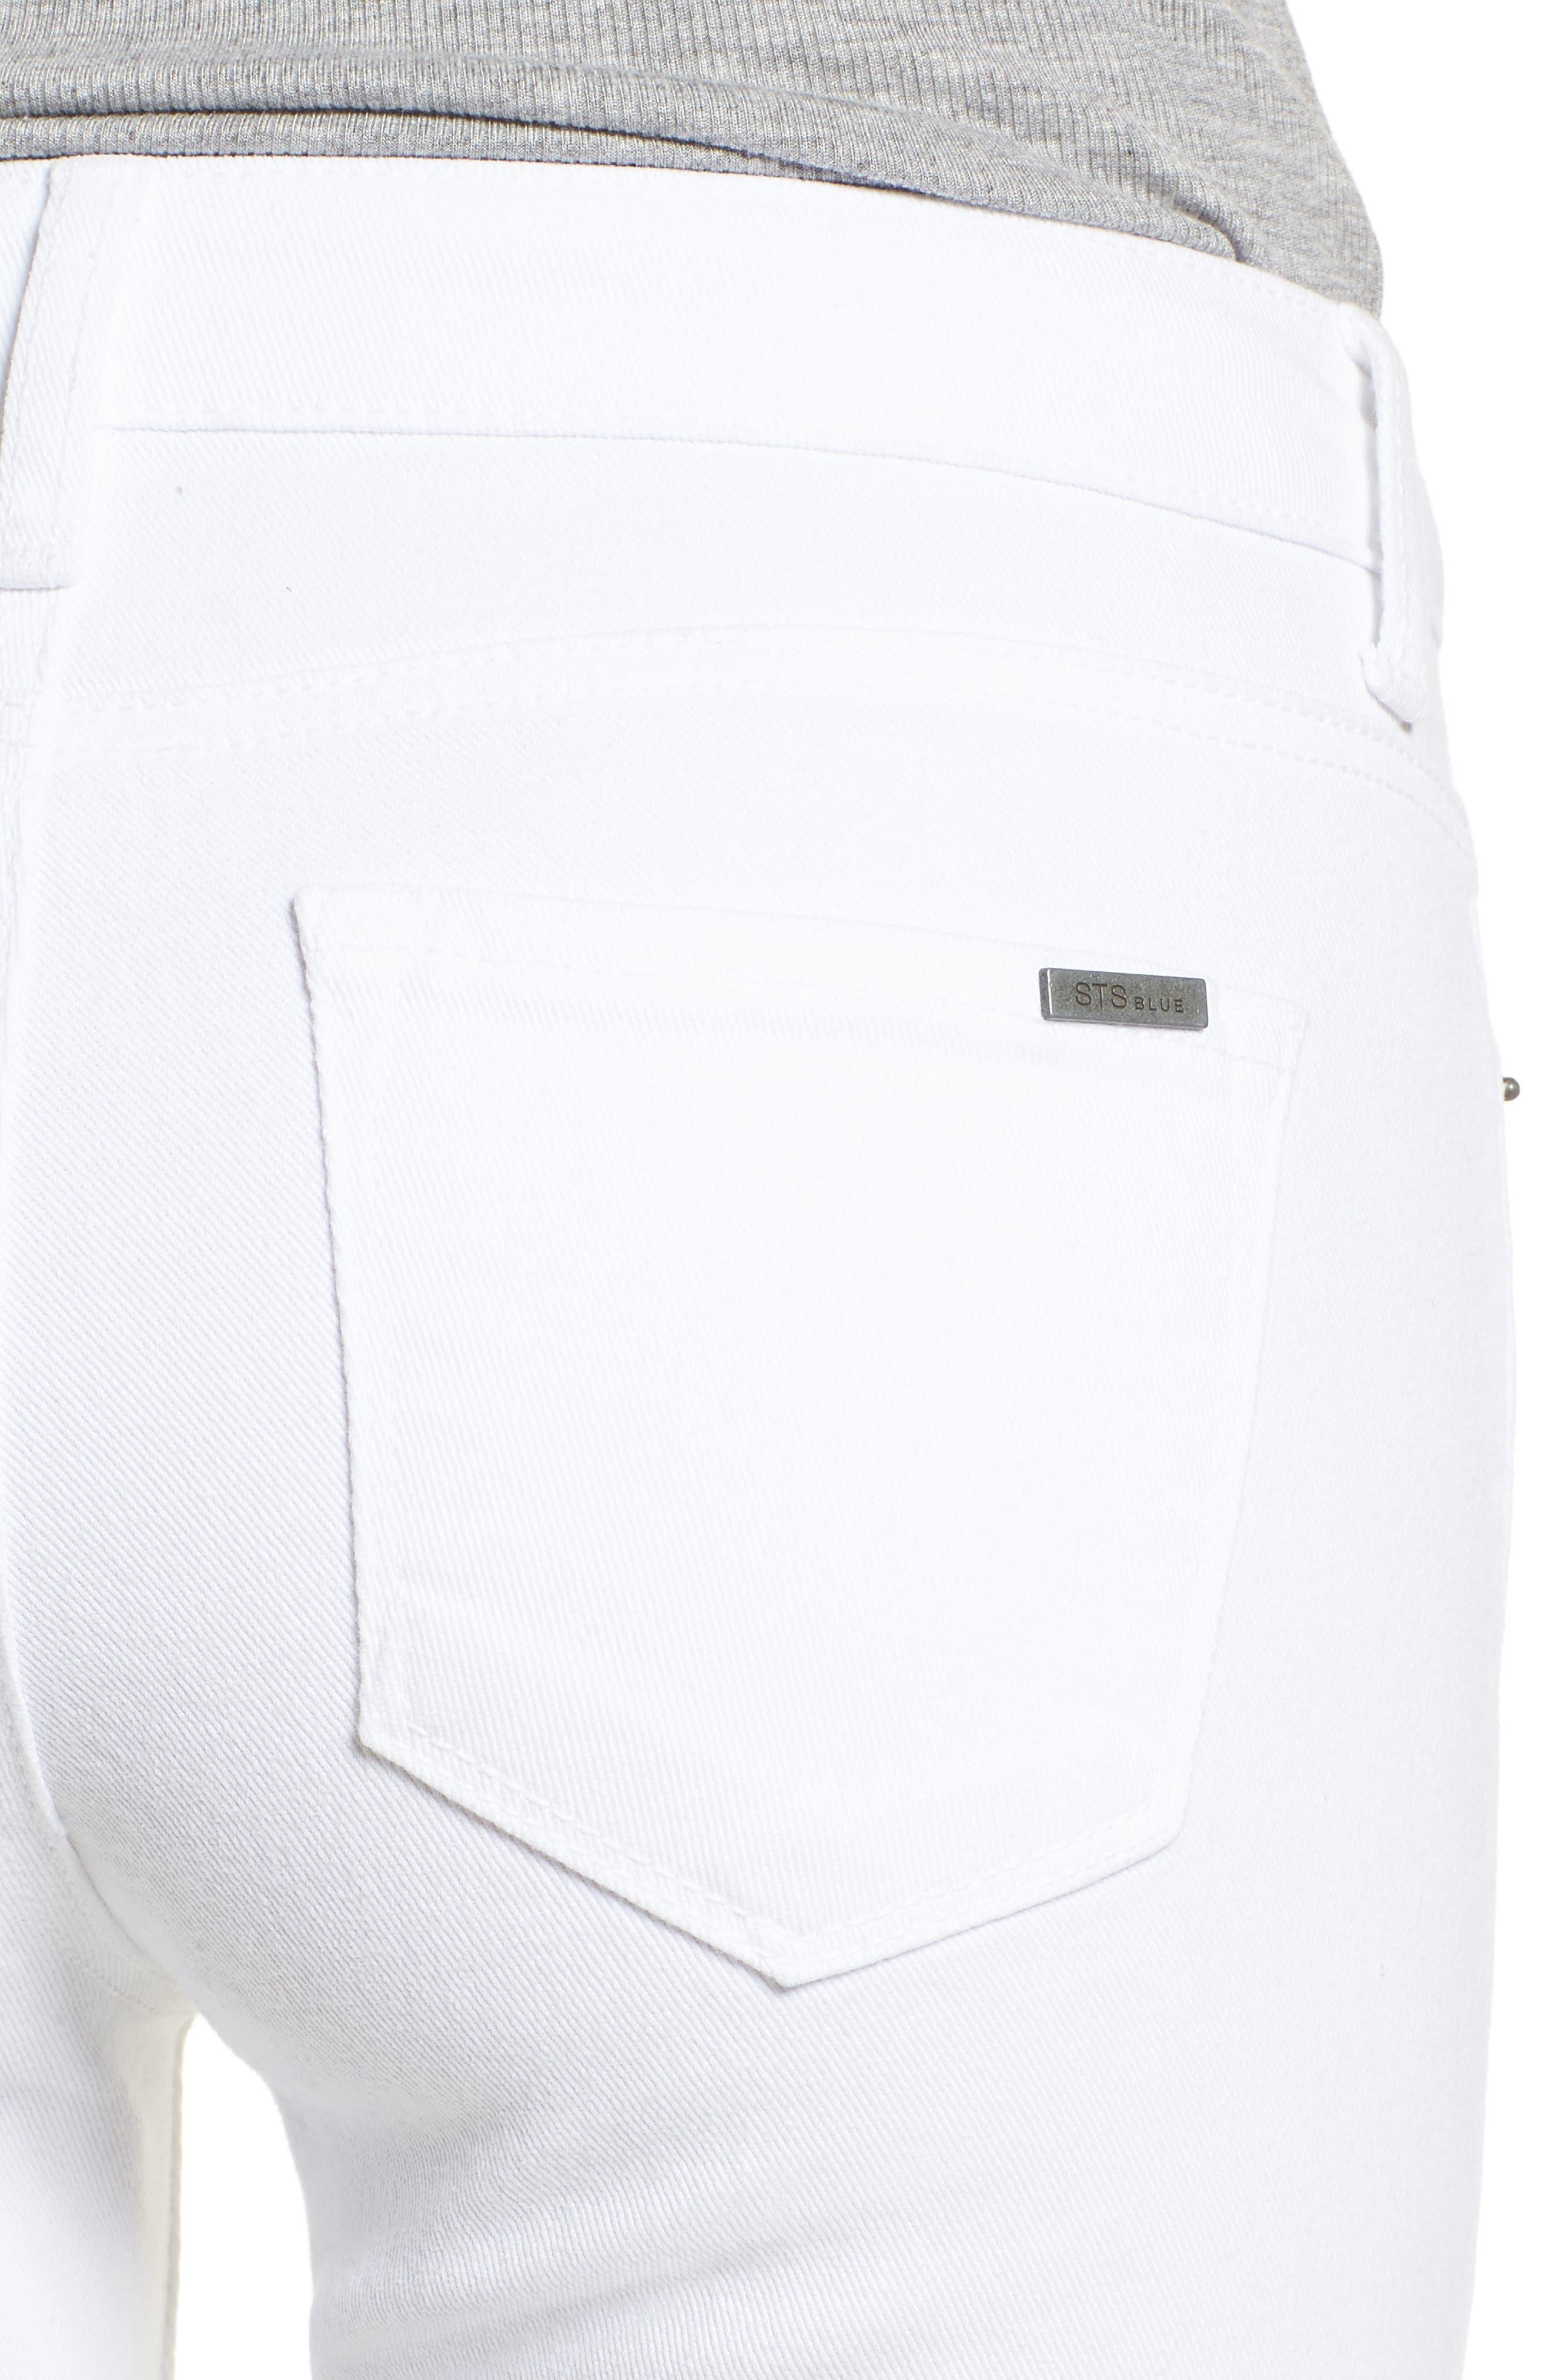 Emma Distressed Skinny Jeans,                             Alternate thumbnail 4, color,                             Optic White